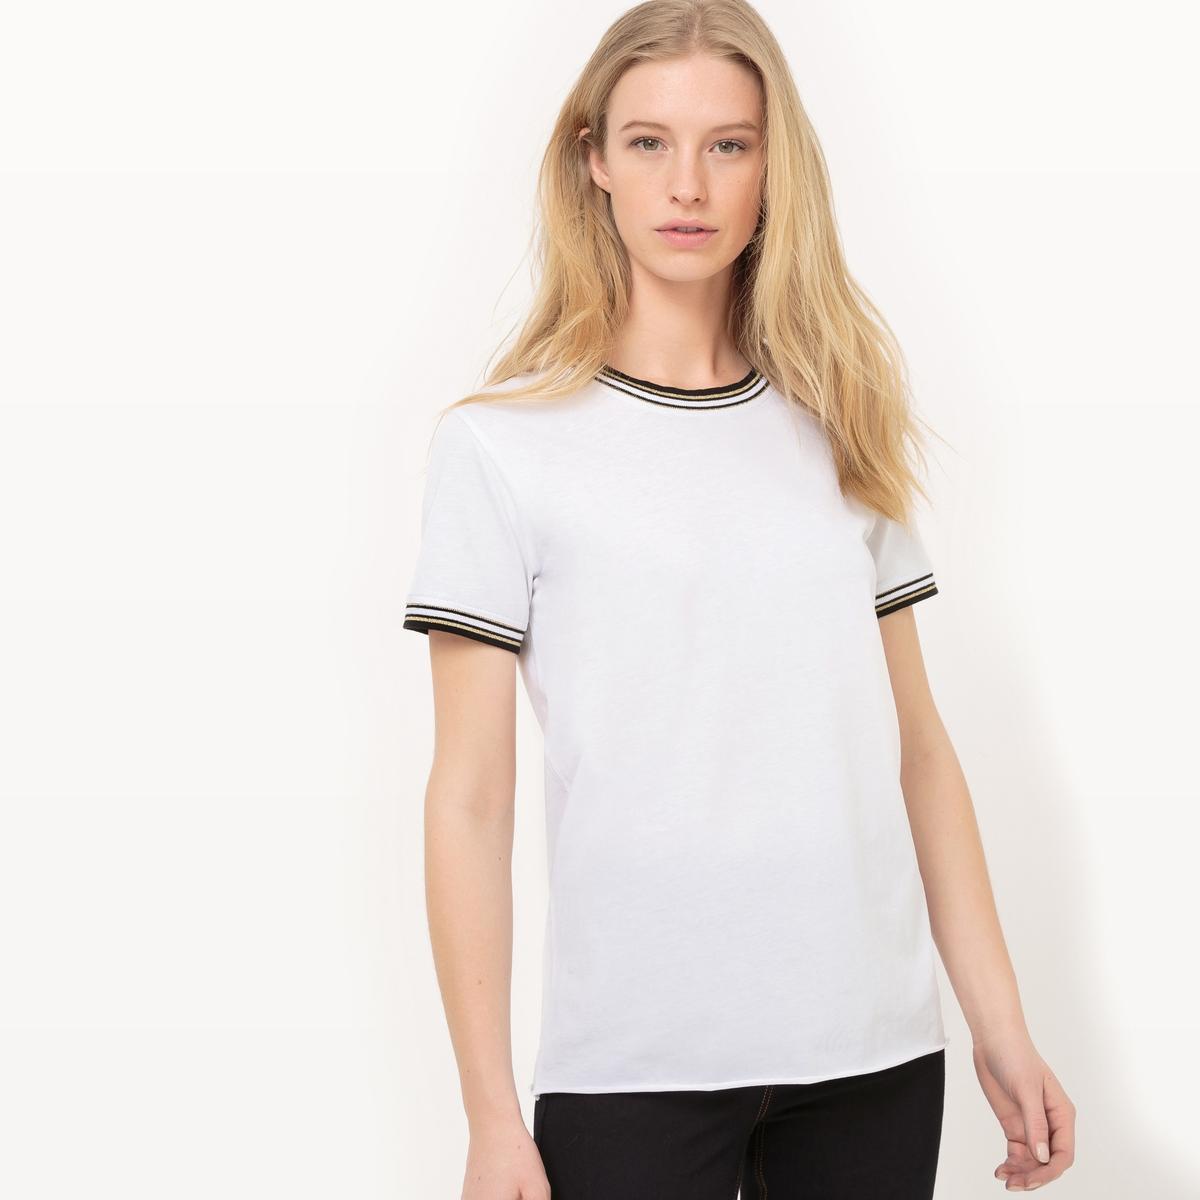 Camiseta de algodón, manga corta